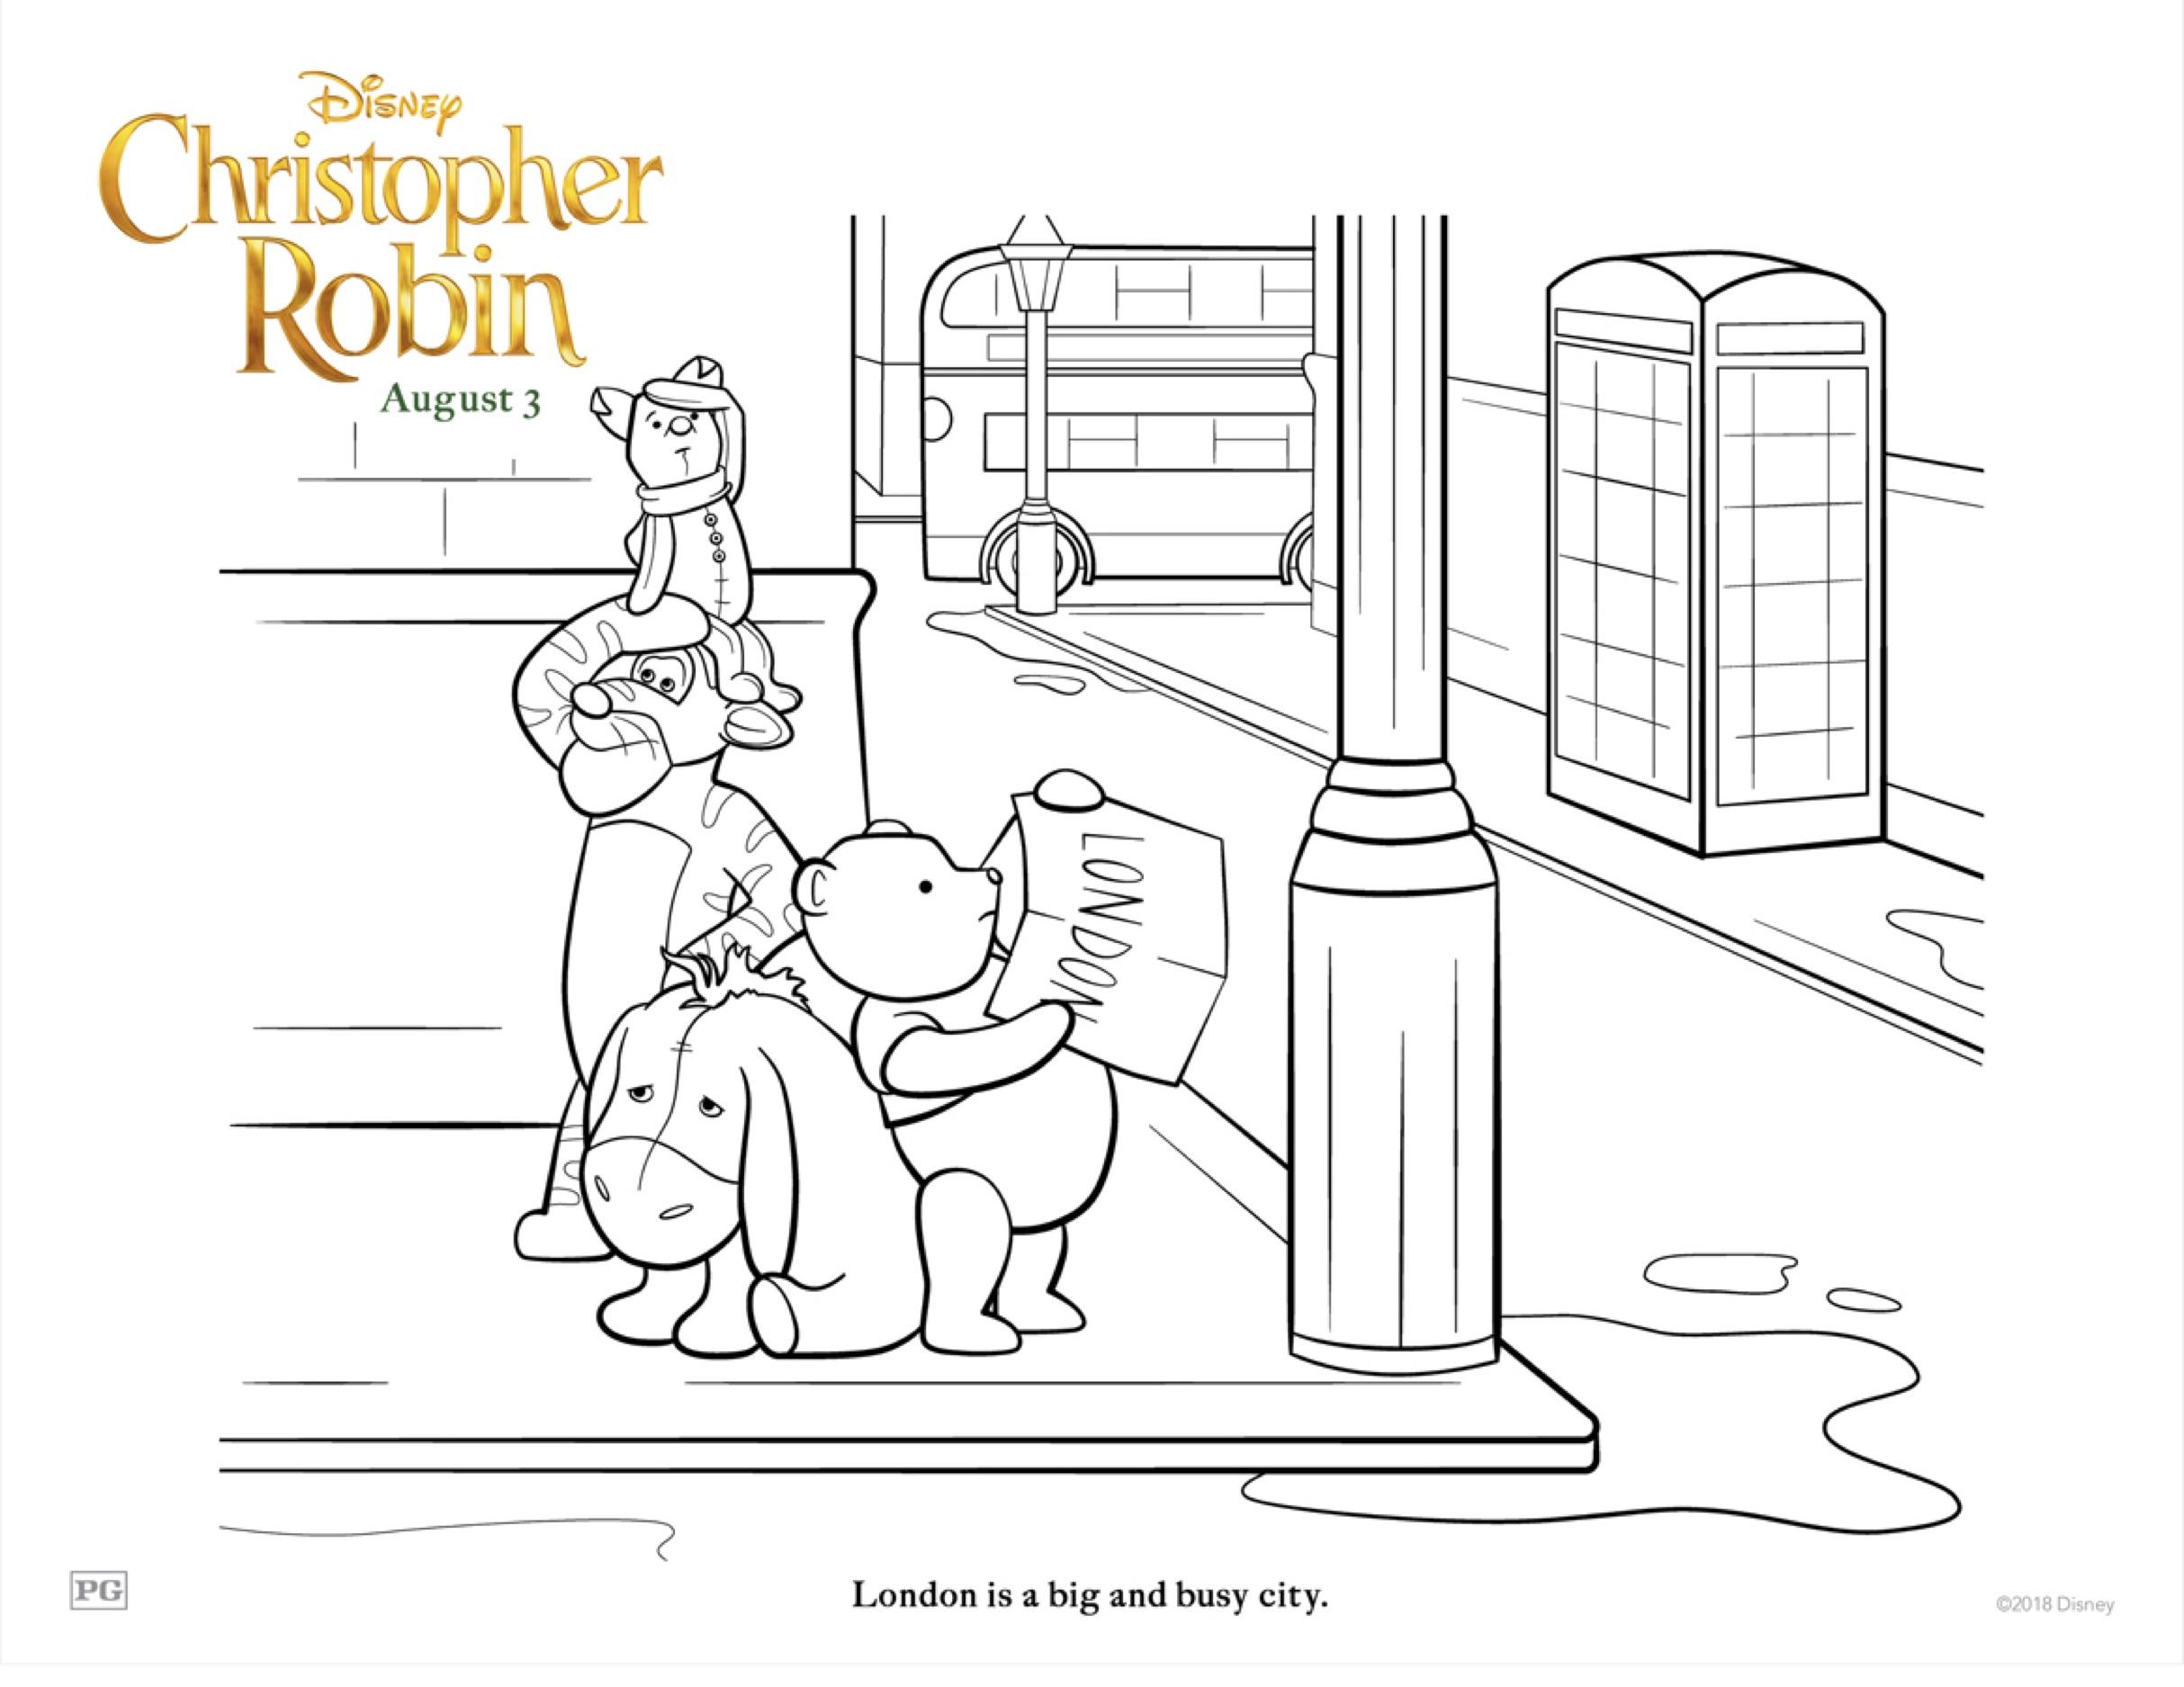 CHRISTOHPER ROBIN COLORING SHEETS